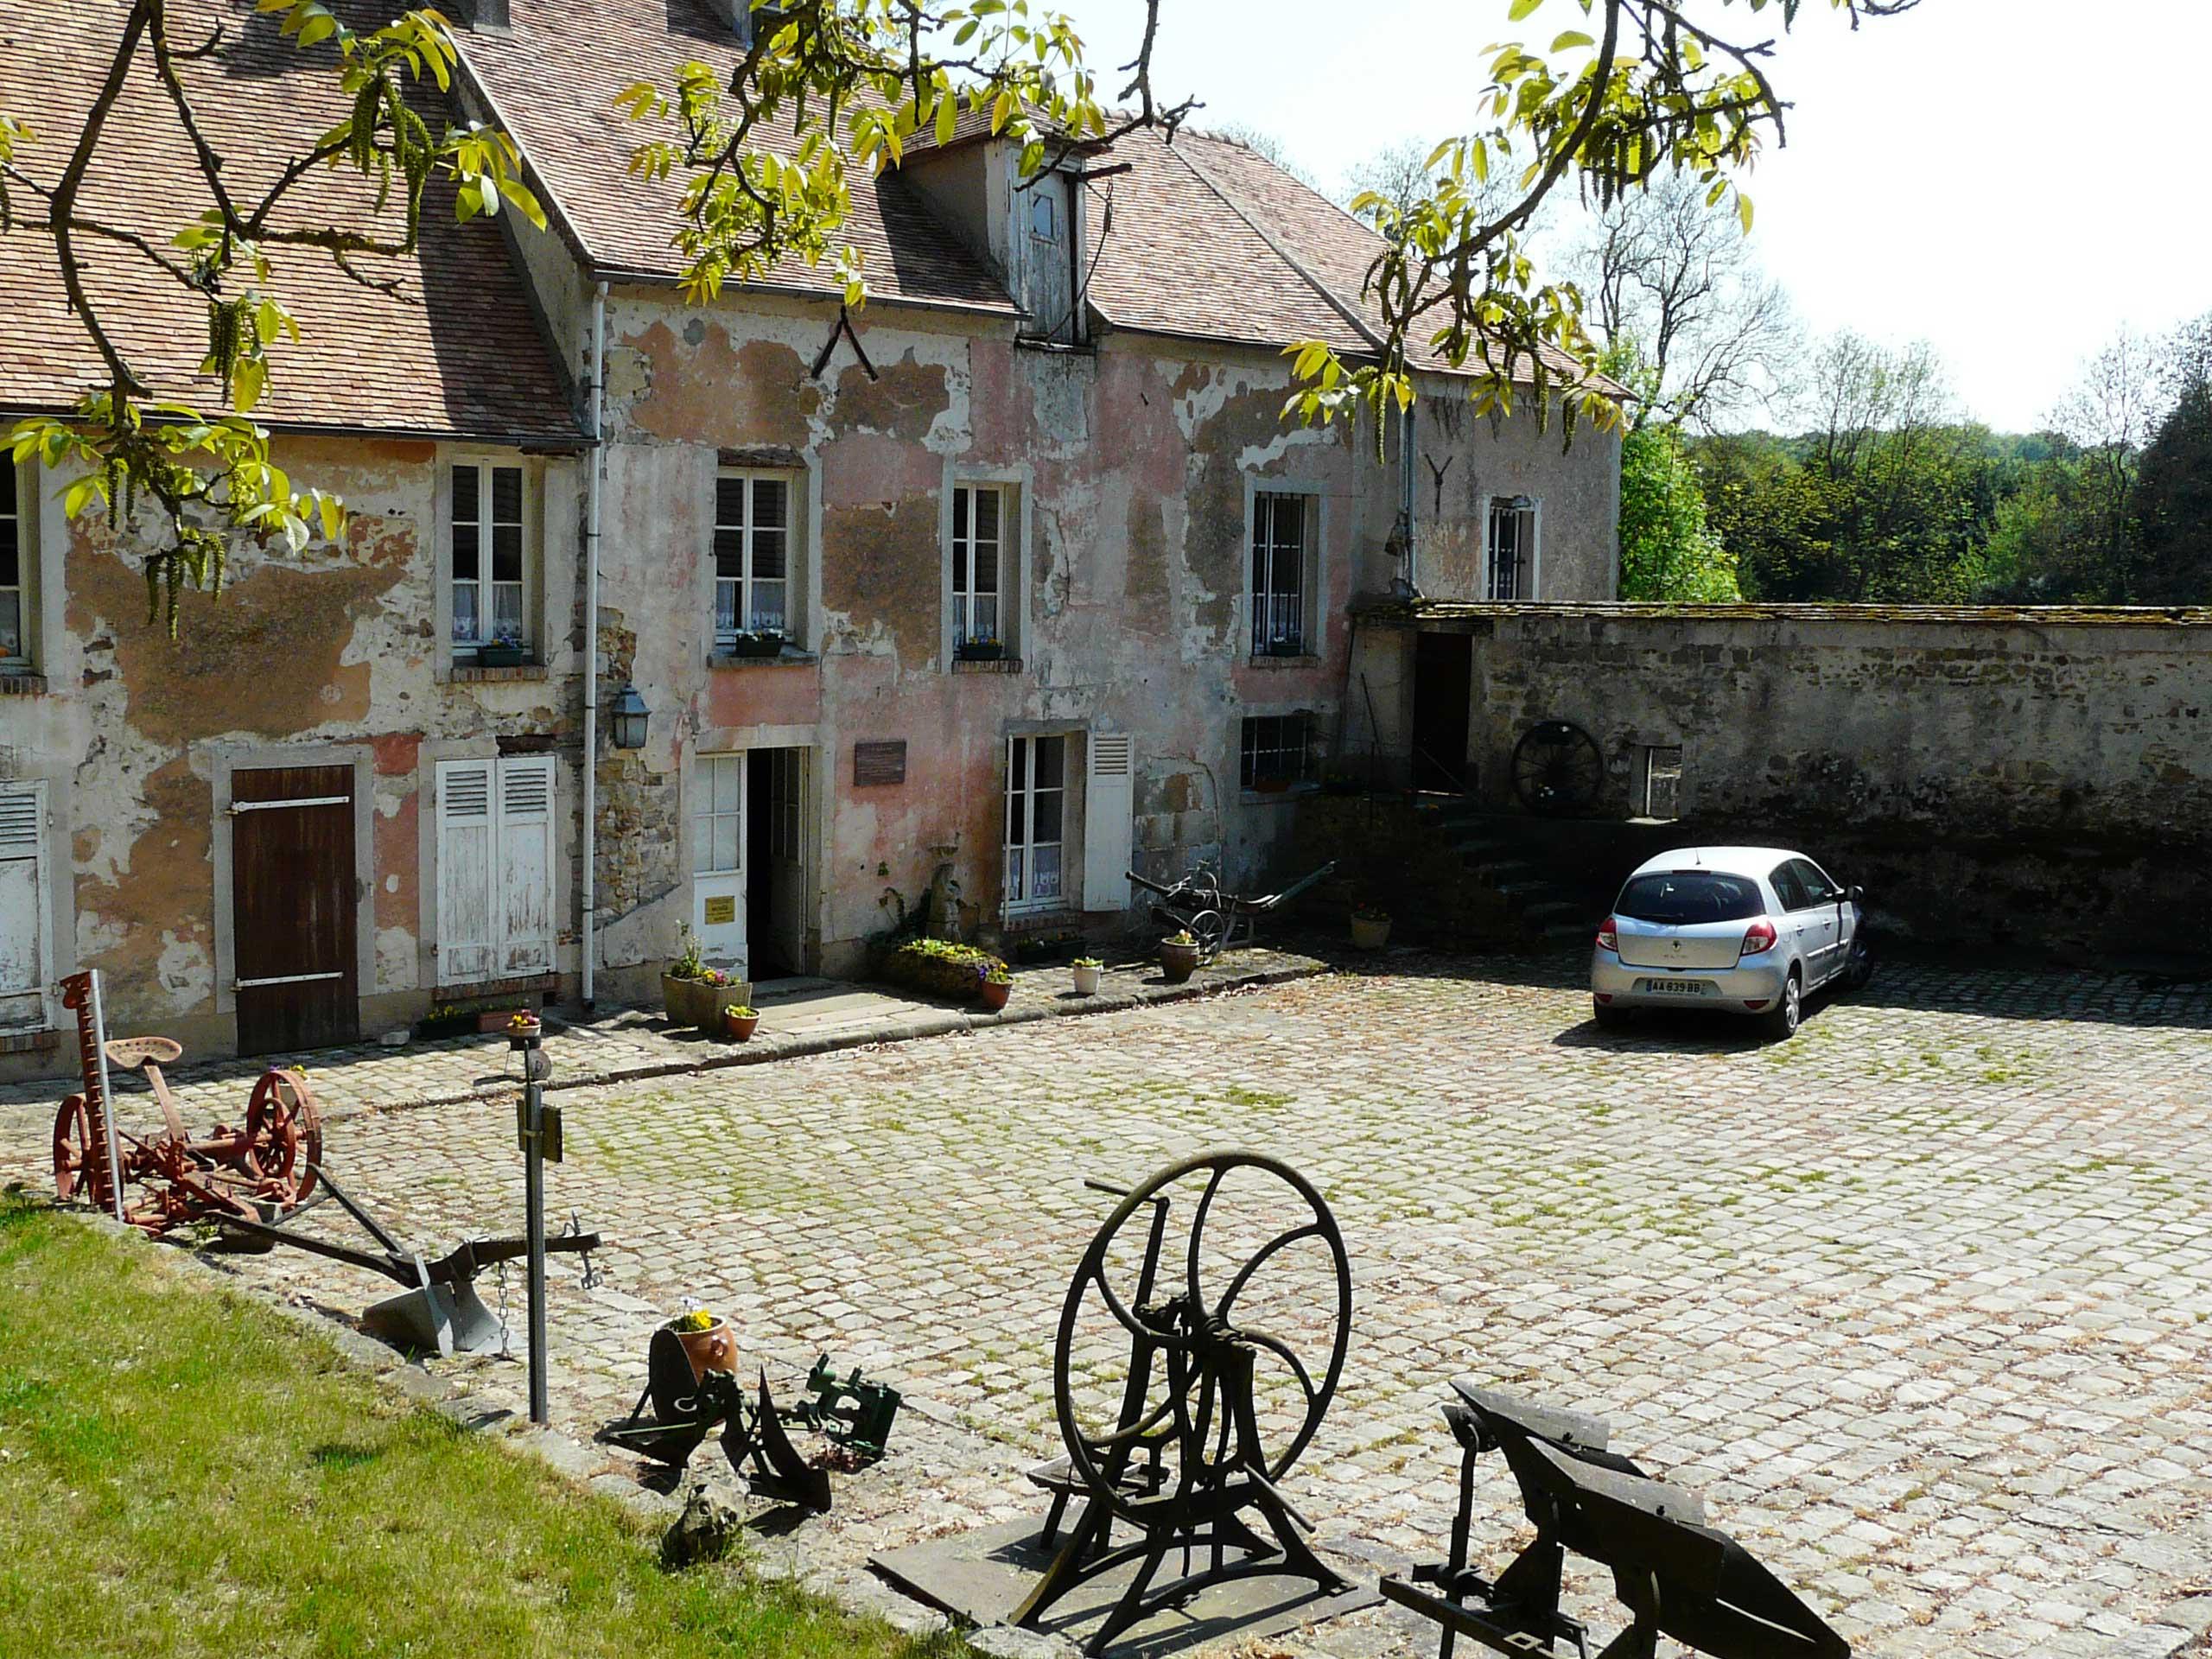 Mairie de Saint-Arnoult-en-Yvelines (78730)